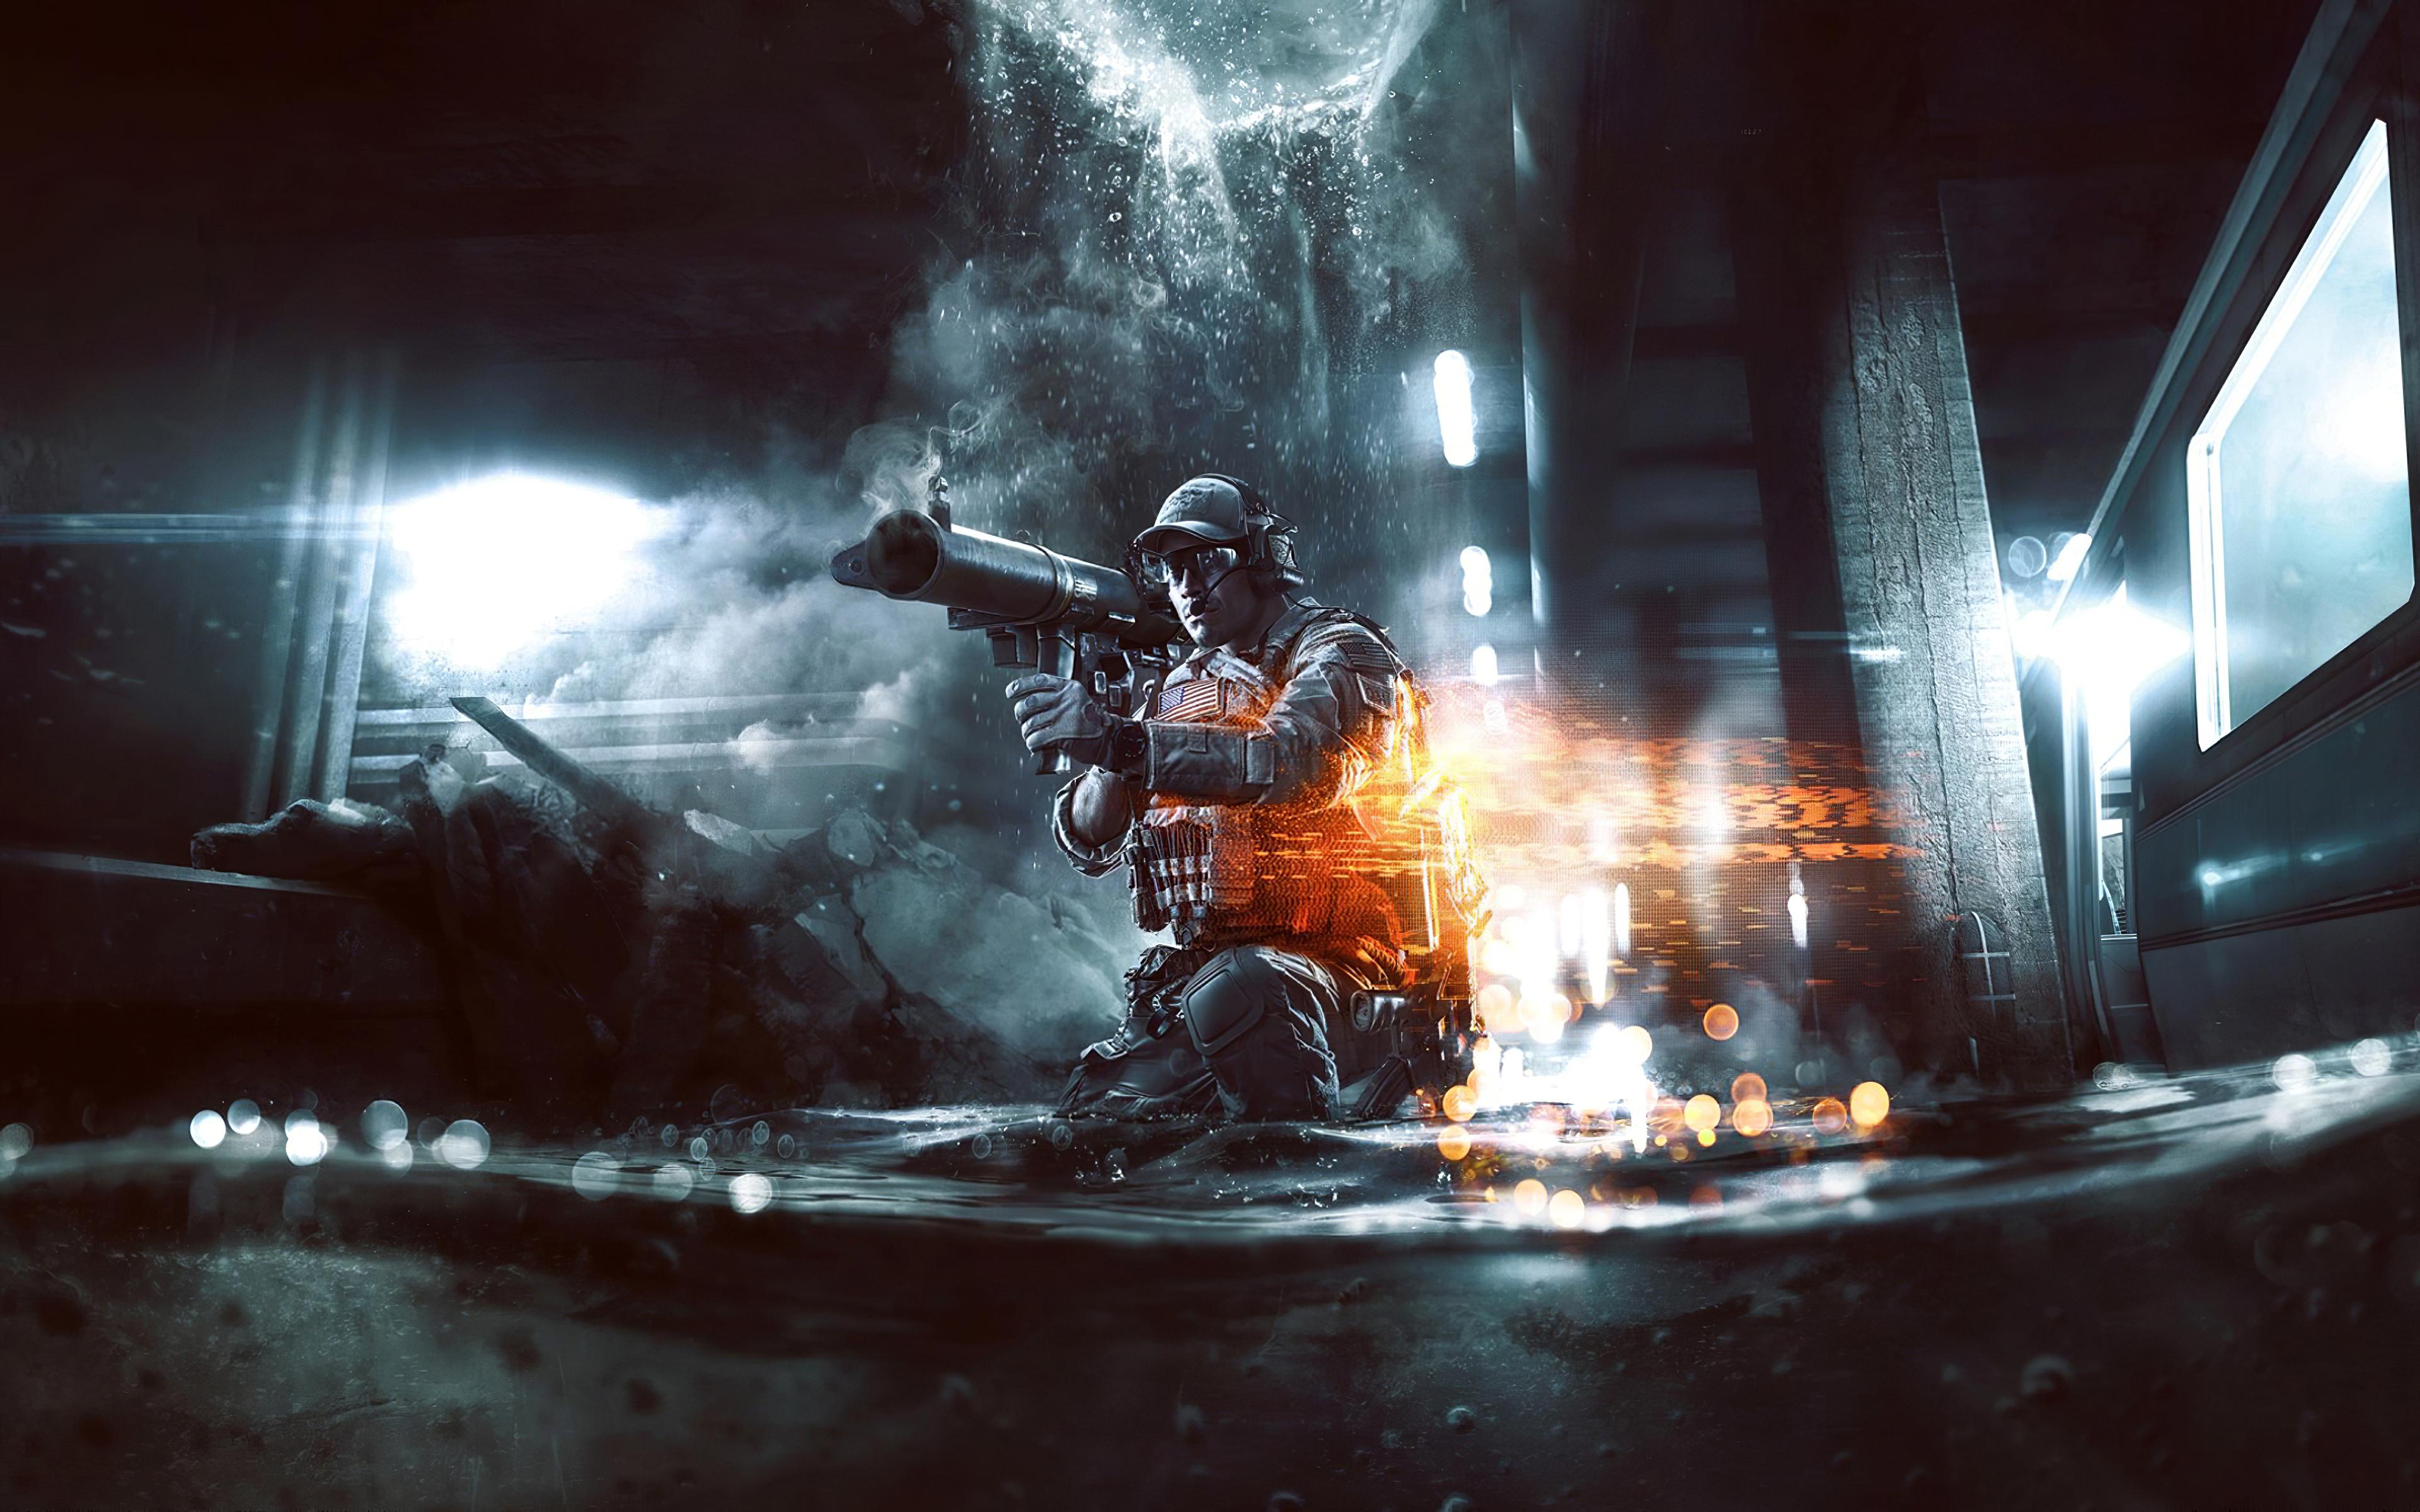 4k Battlefield 4 2019 Wallpaper Hd Games 4k Wallpapers